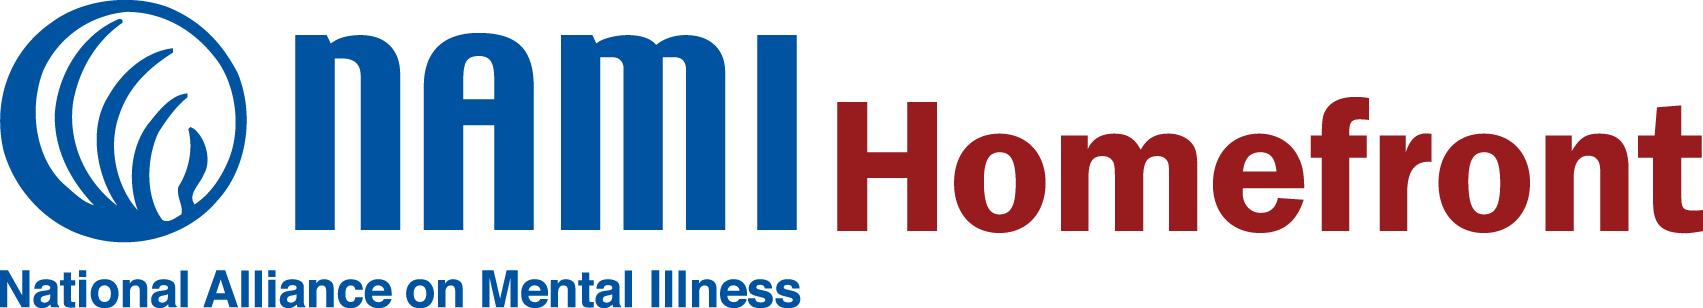 Copy of Homefront-logo.jpeg